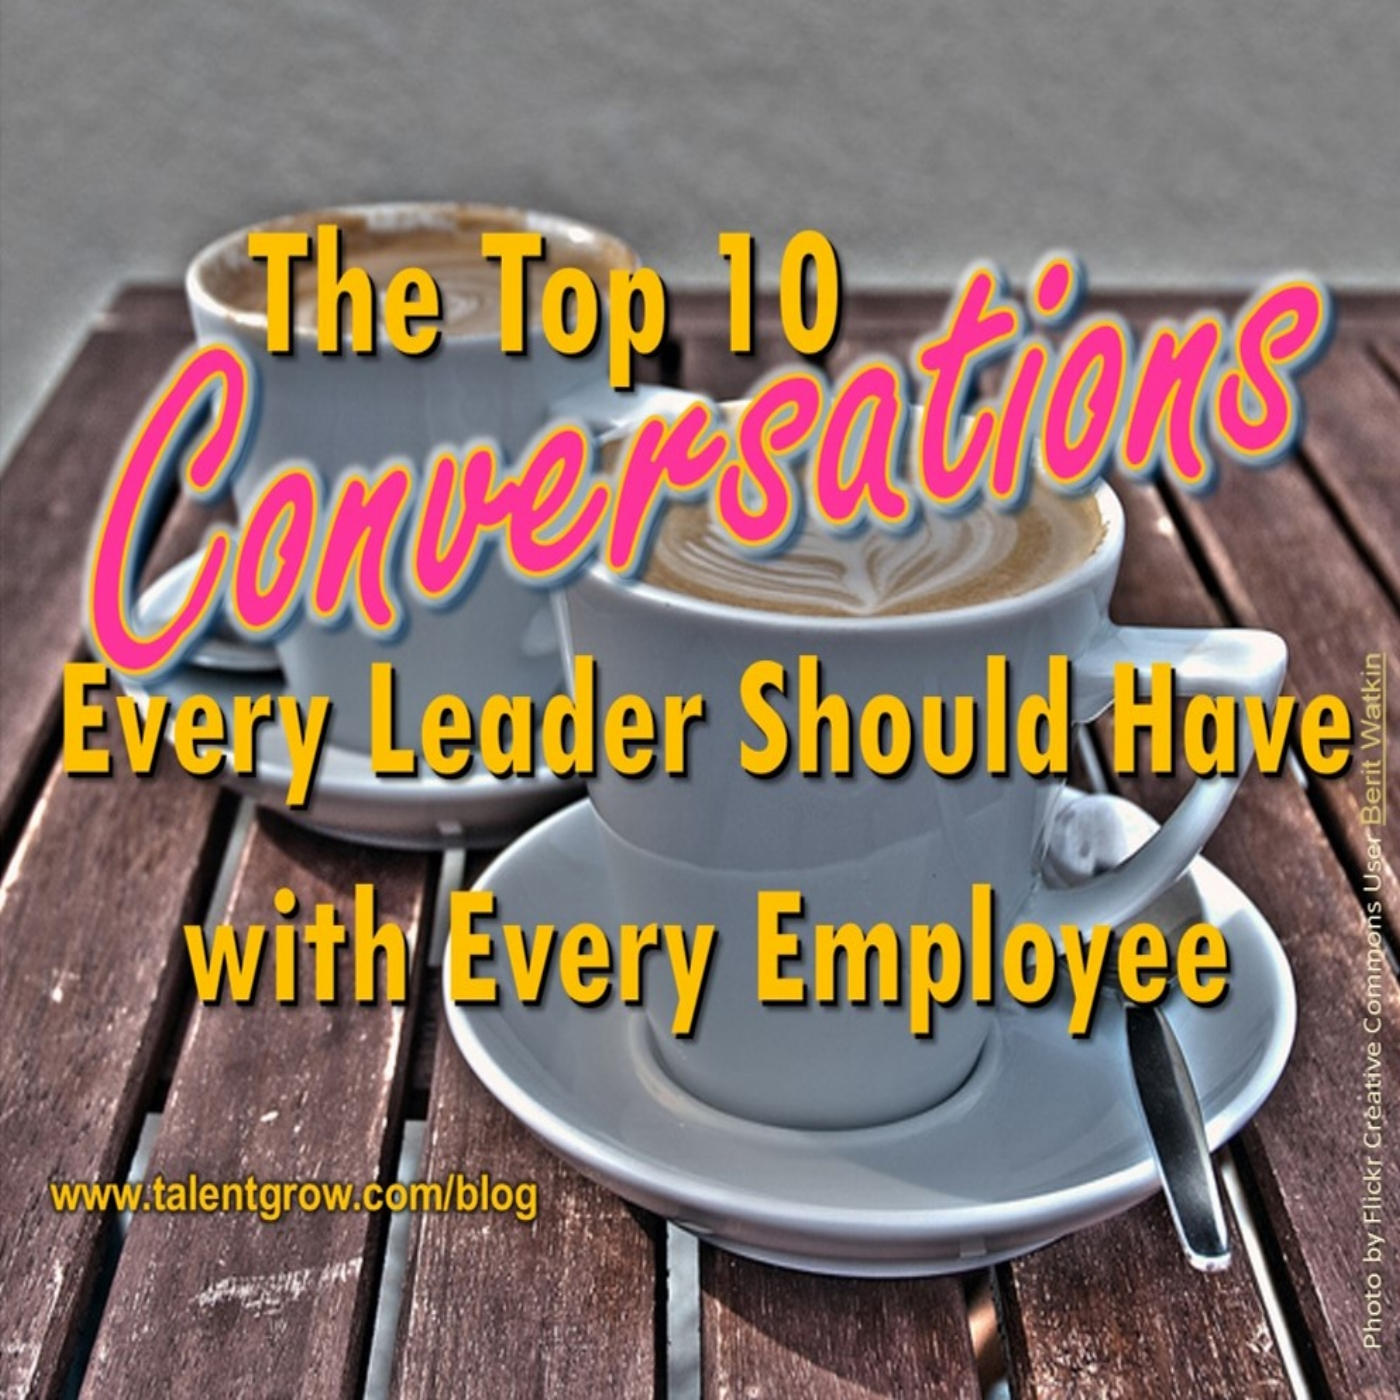 10 conversations blog thumbnail.jpg